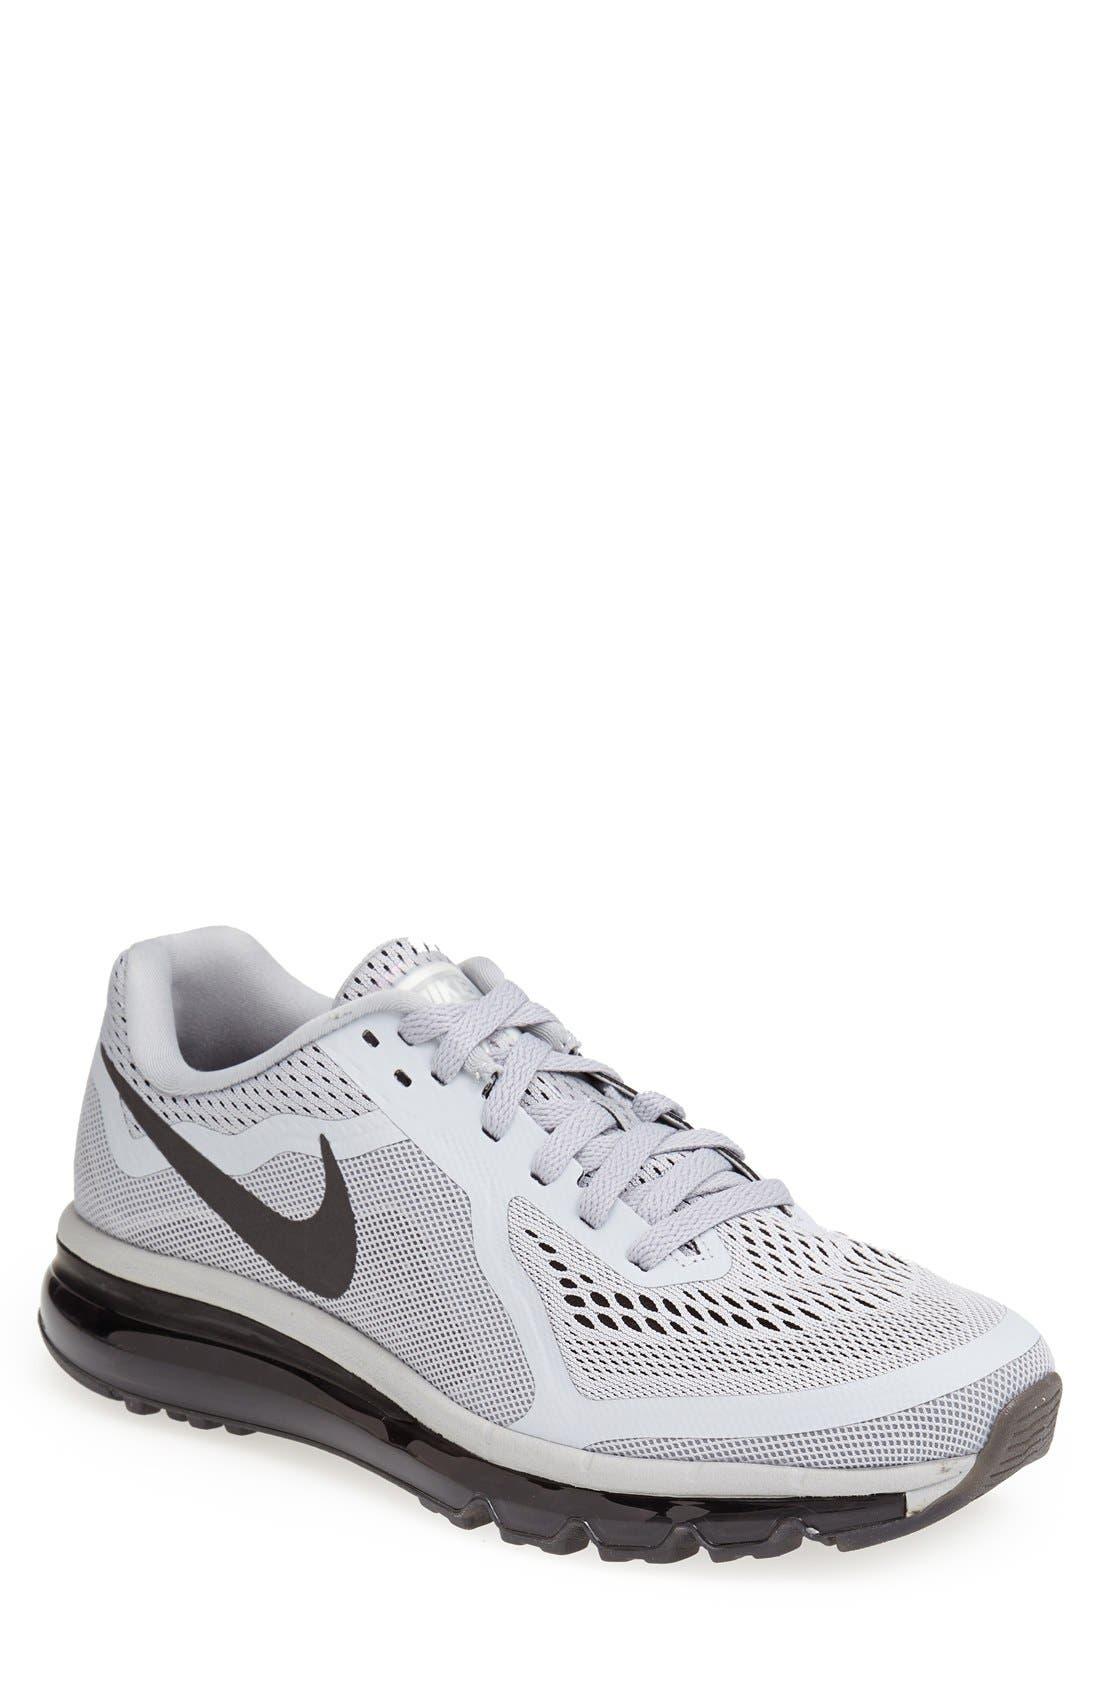 Main Image - Nike 'Air Max 2014' Running Shoe (Men)